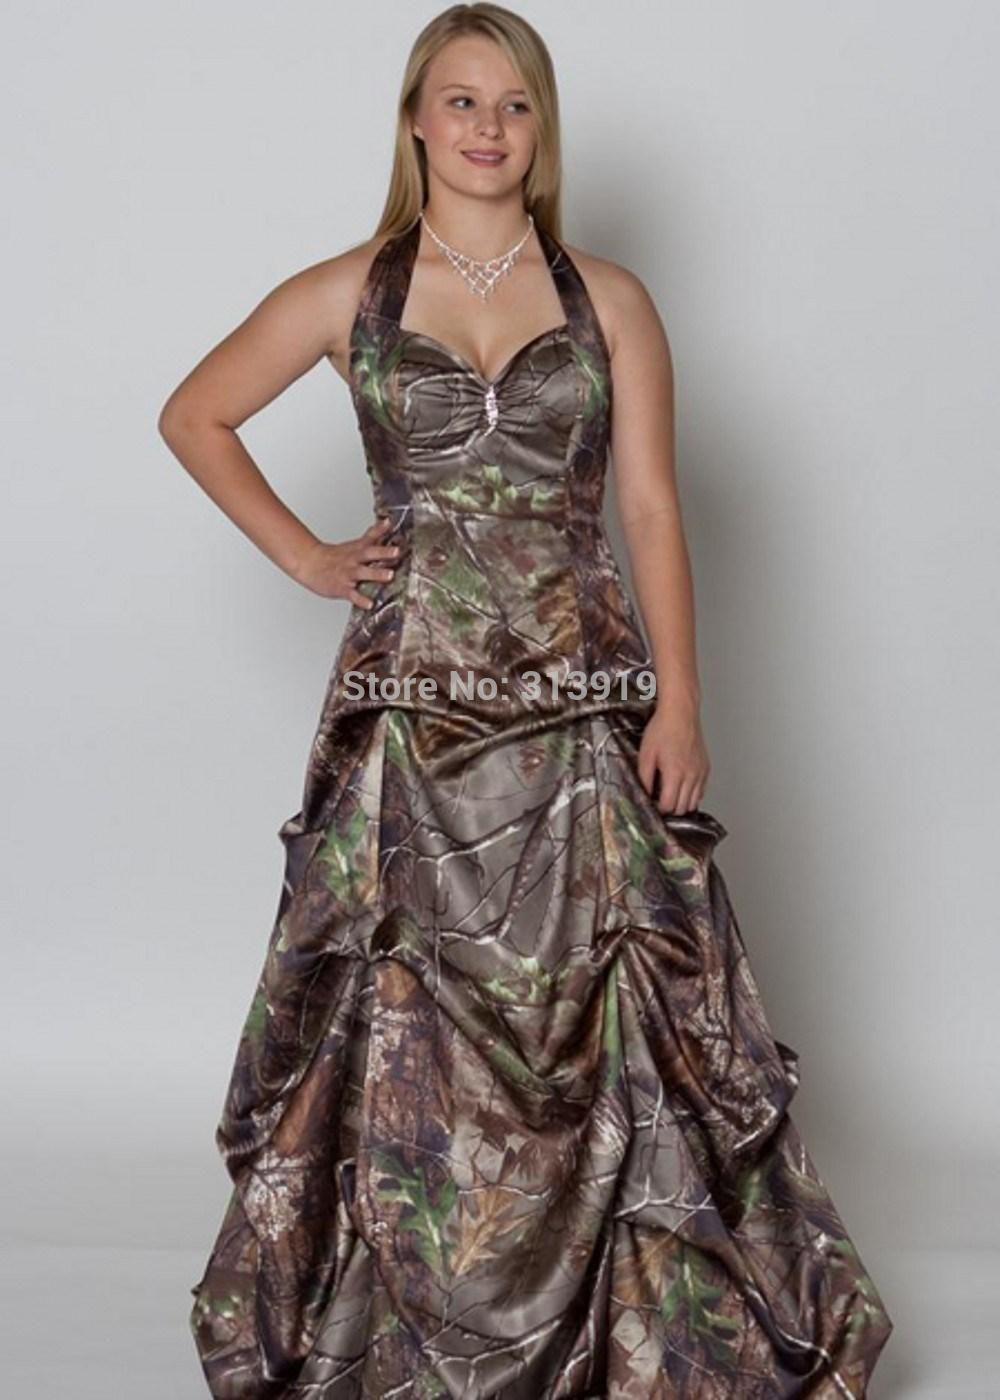 Wedding dresses camo  Click to Buy ucuc printing military realtree camo prom dress  new